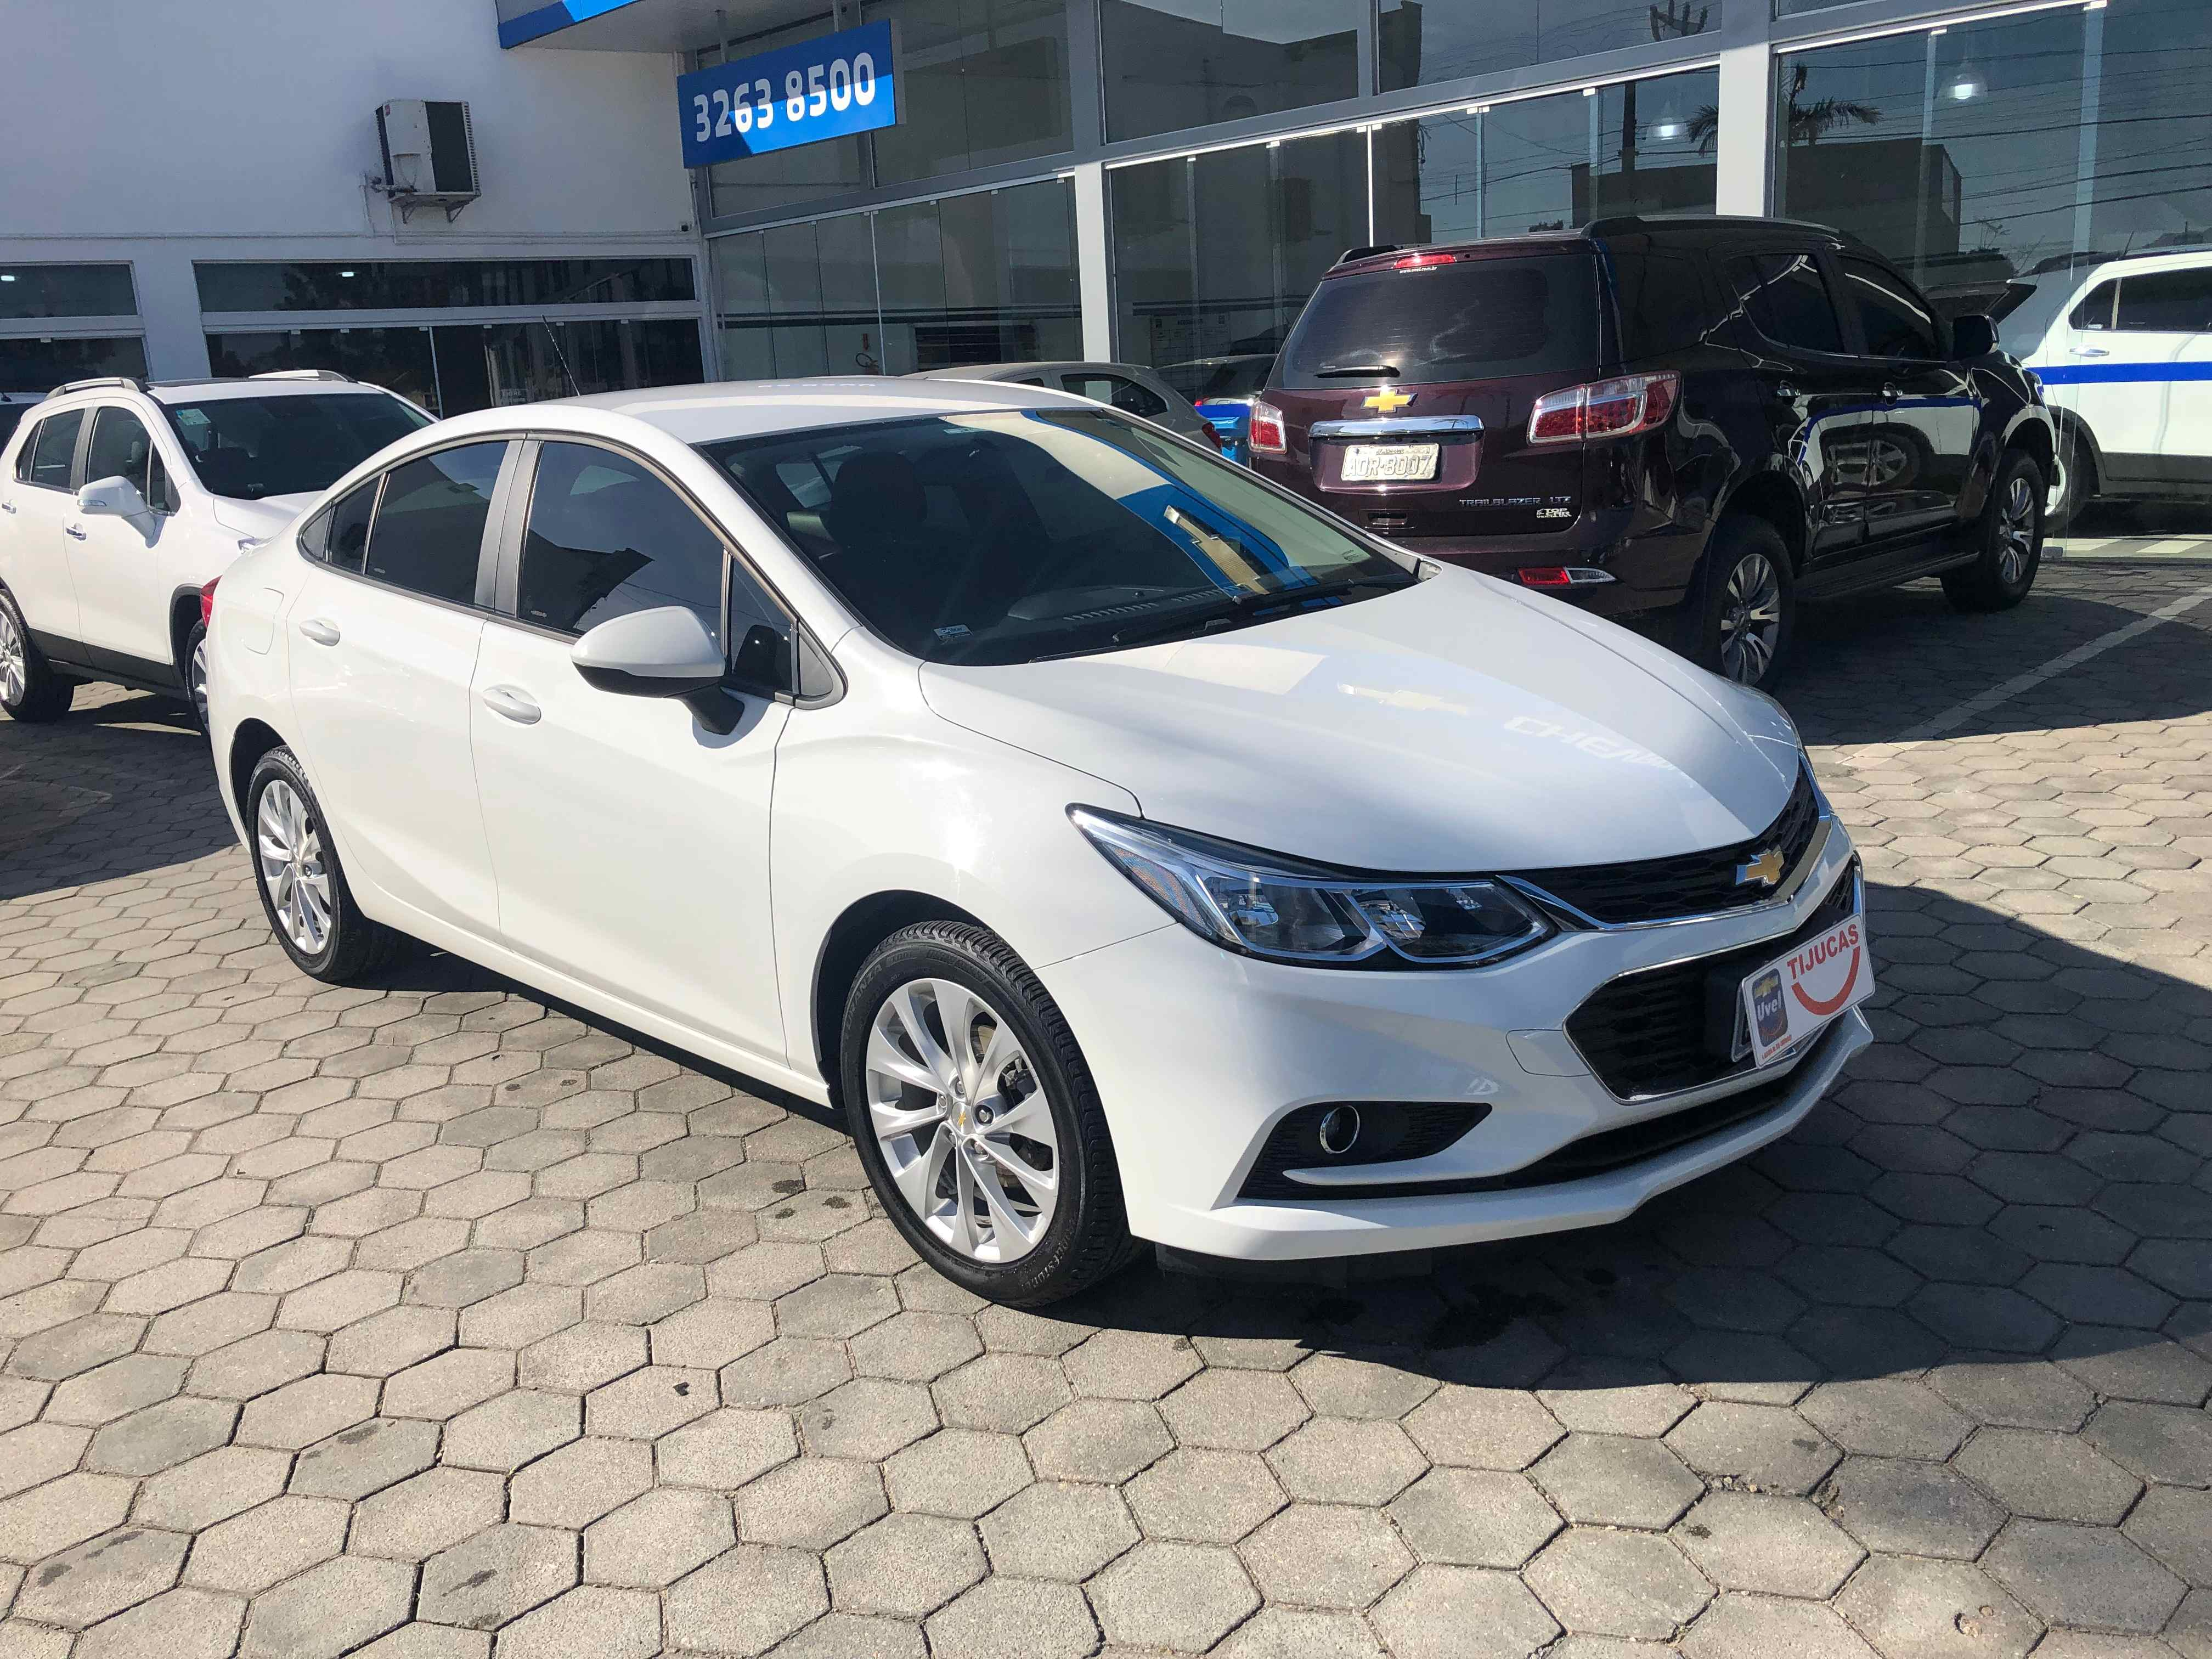 Chevrolet Cruze LT 1.4L 2017